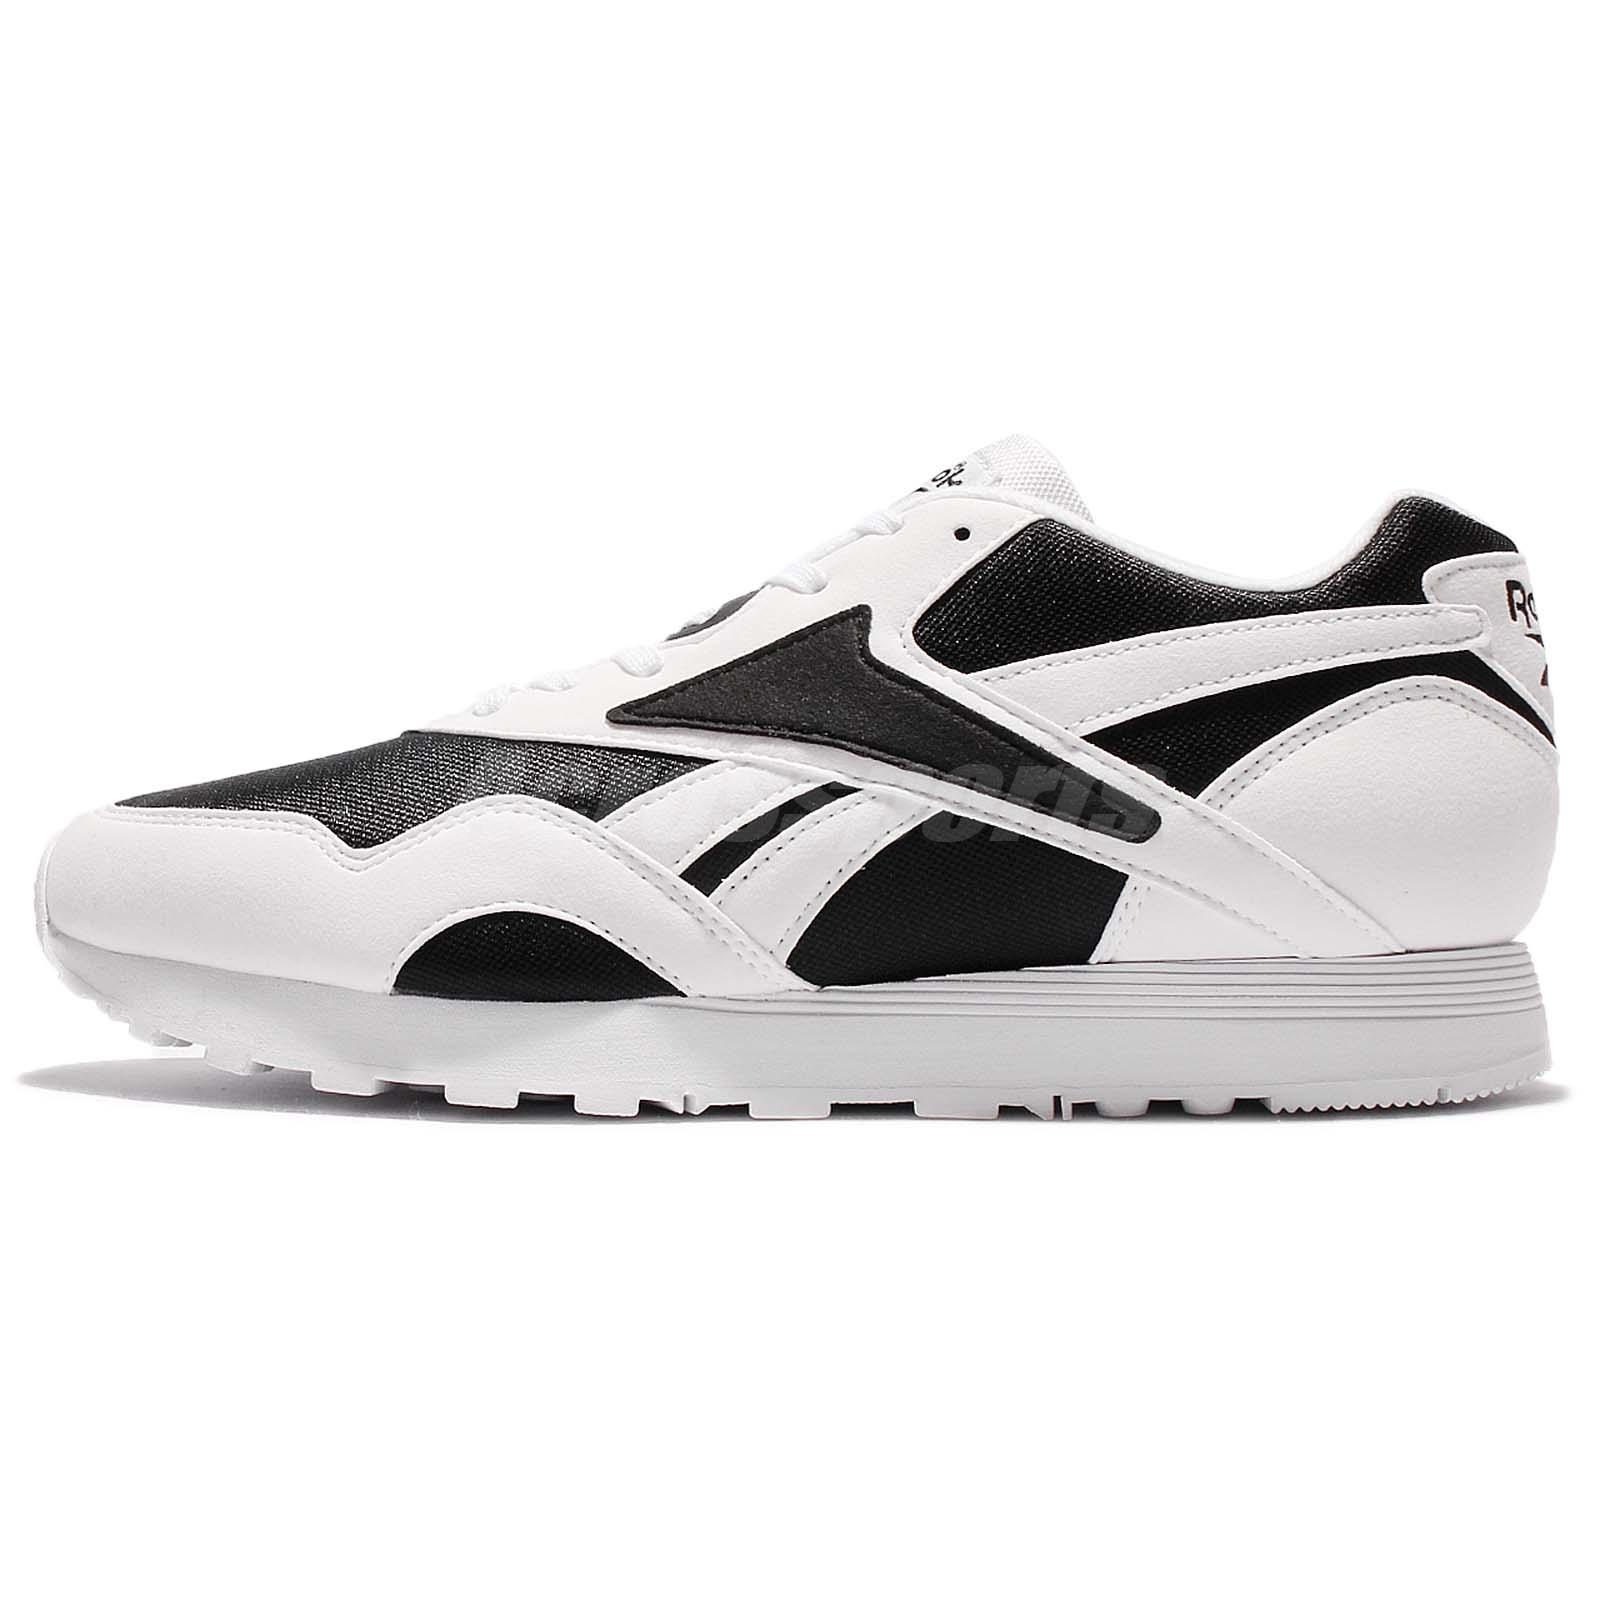 fc0b51decb52f9 Reebok Rapide WL Old School Vibe White Black Men Running Shoes Sneakers  BS5801